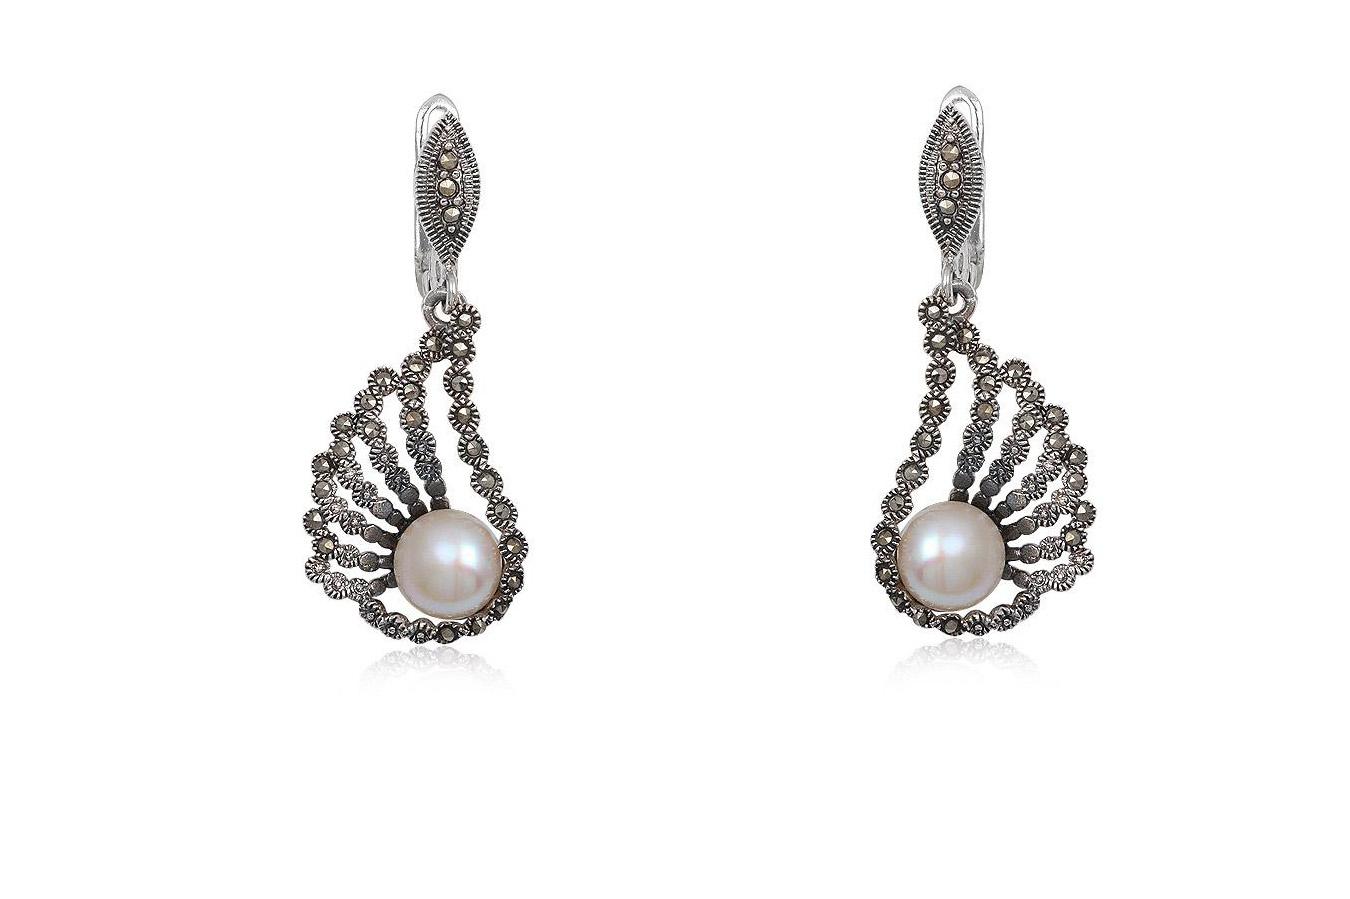 cercei de seara cu perle albe